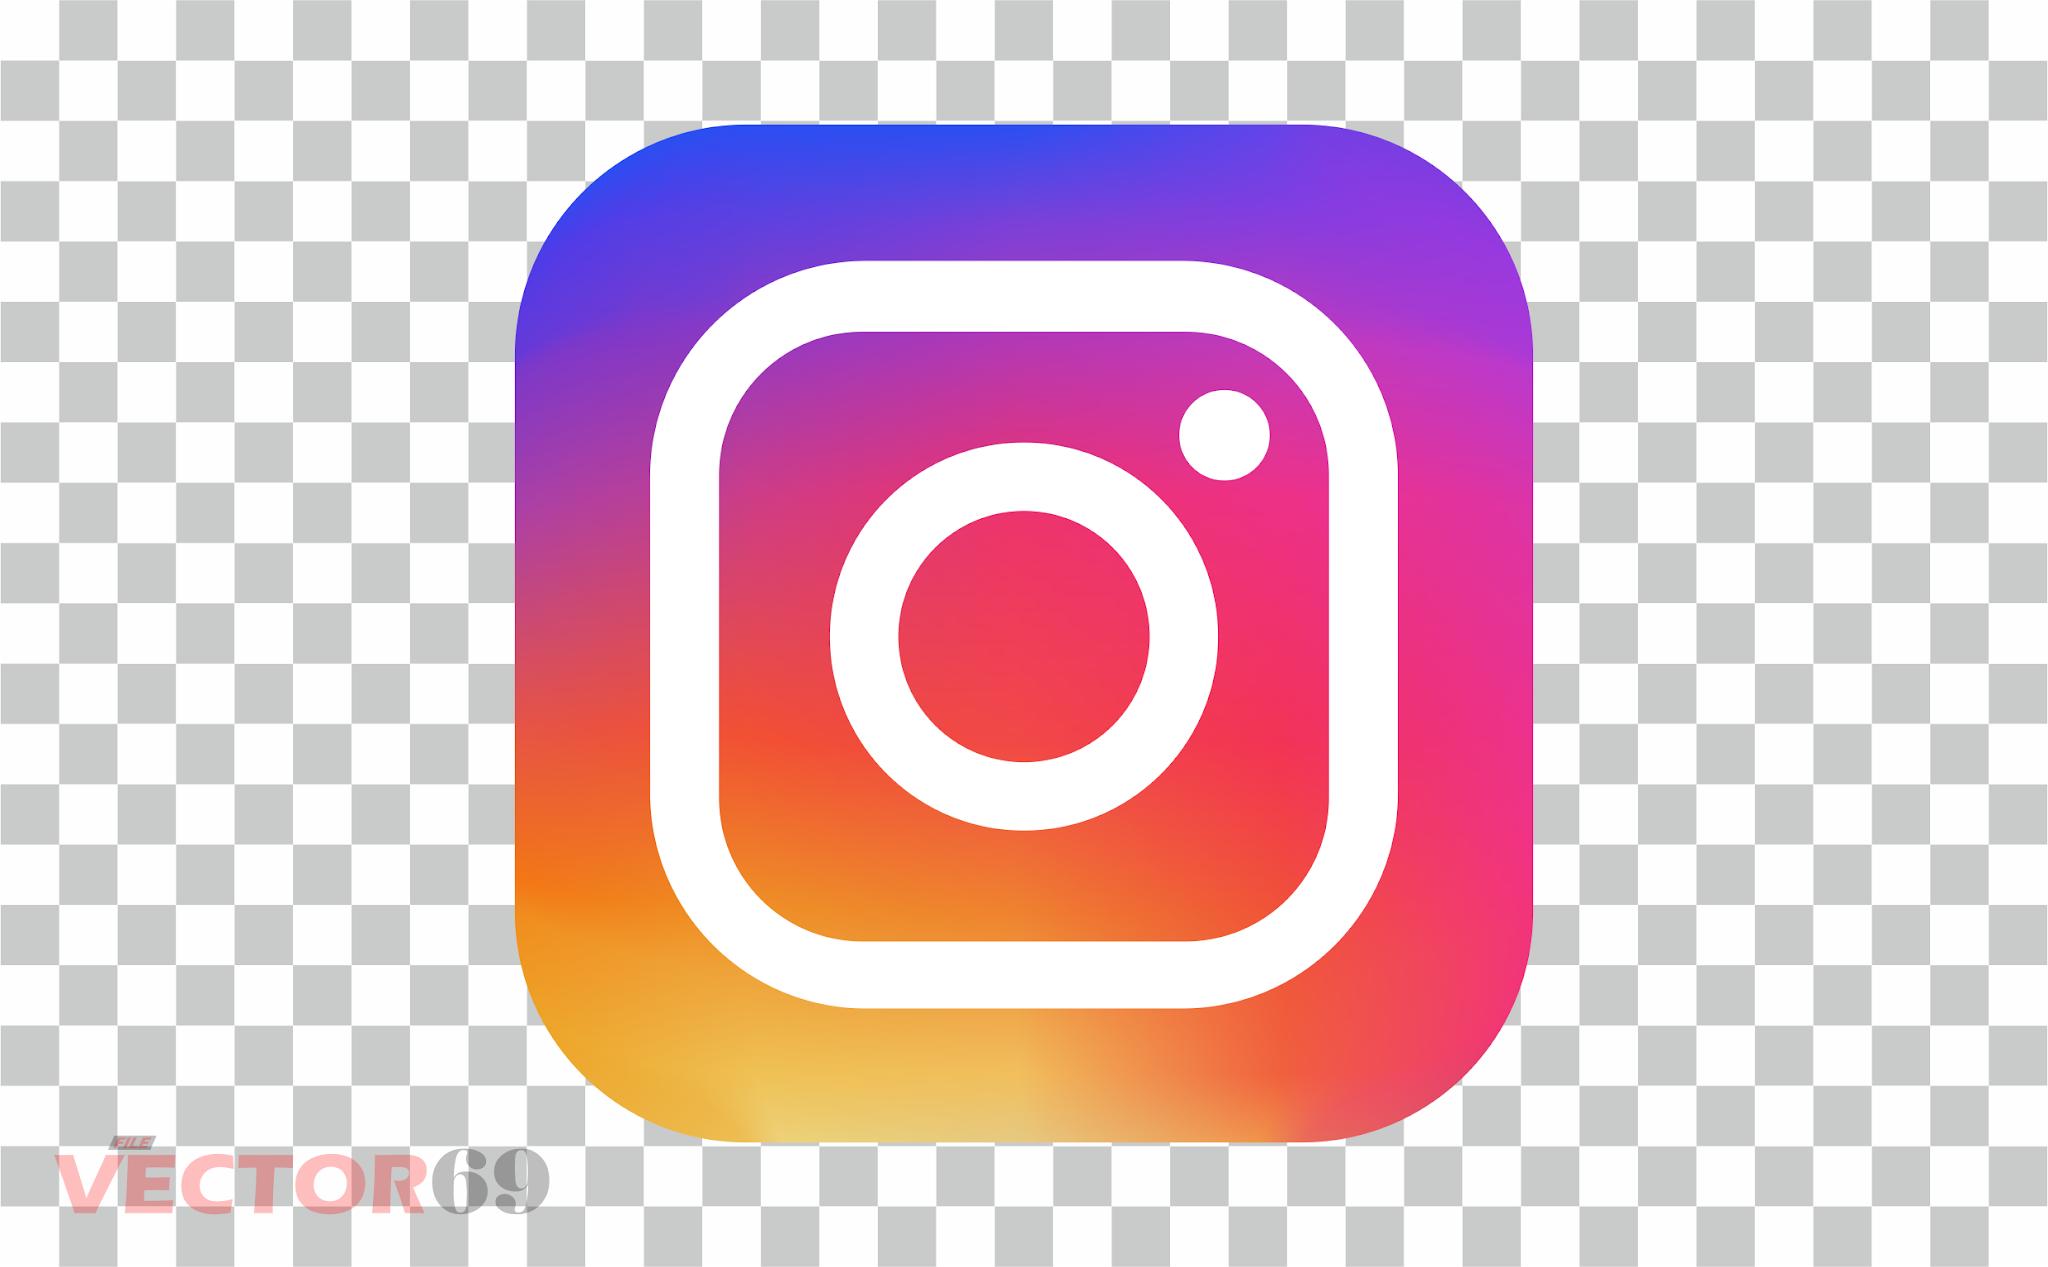 Instagram Logo - Download Vector File PNG (Portable Network Graphics)